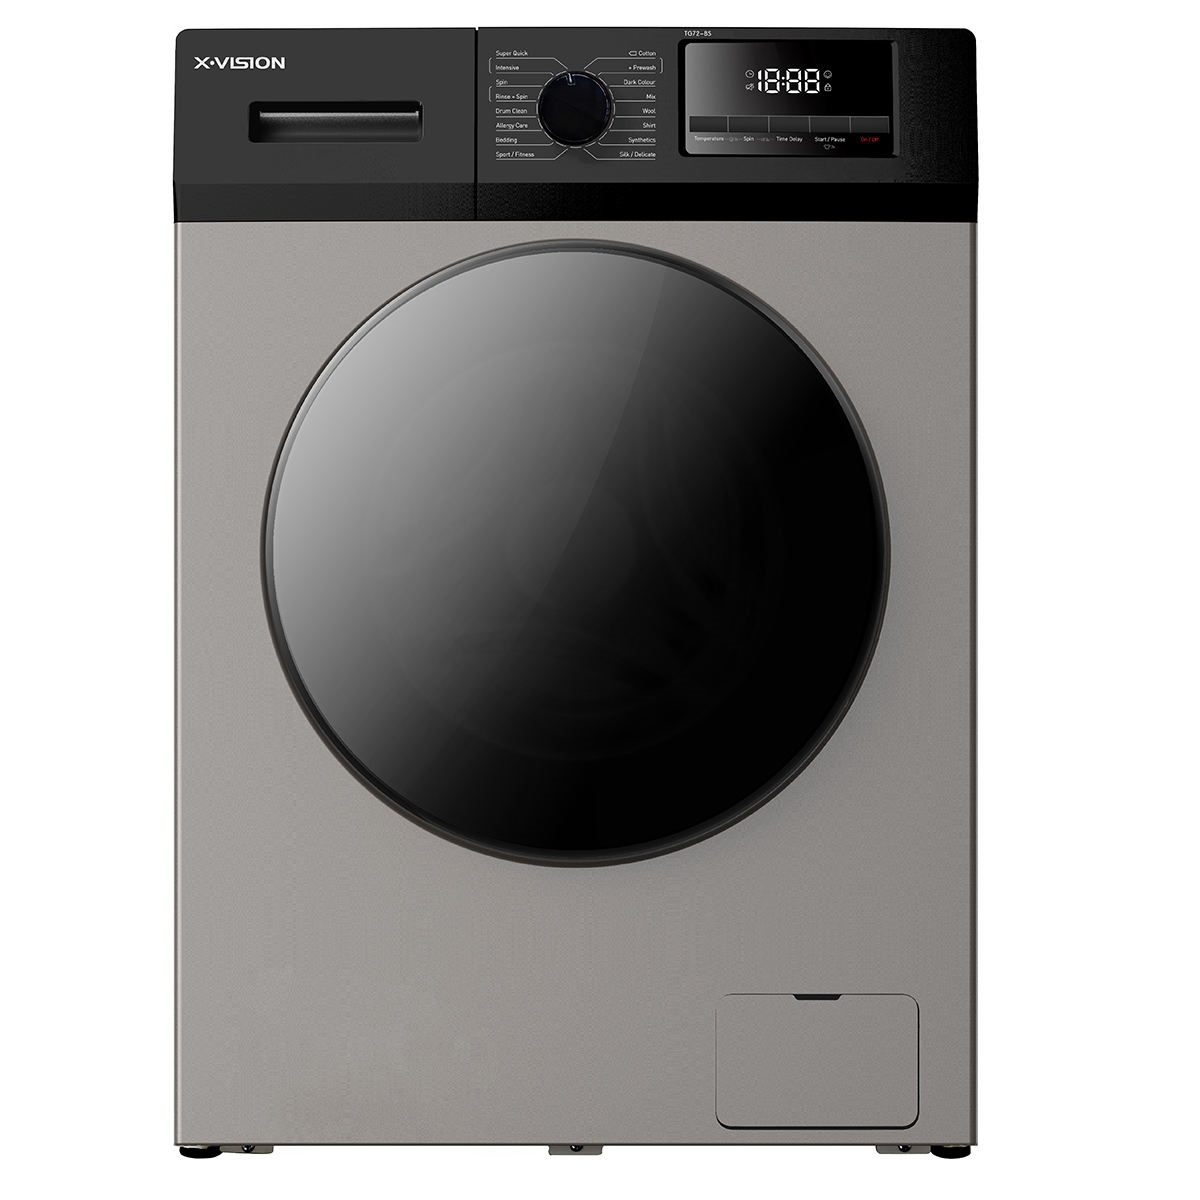 فروش نقدی و اقساطی ماشین لباسشویی ایکس ویژن مدل ماشین لباسشویی ایکس ویژن مدل TG72-BW/BS ظرفیت 7کیلوگرم